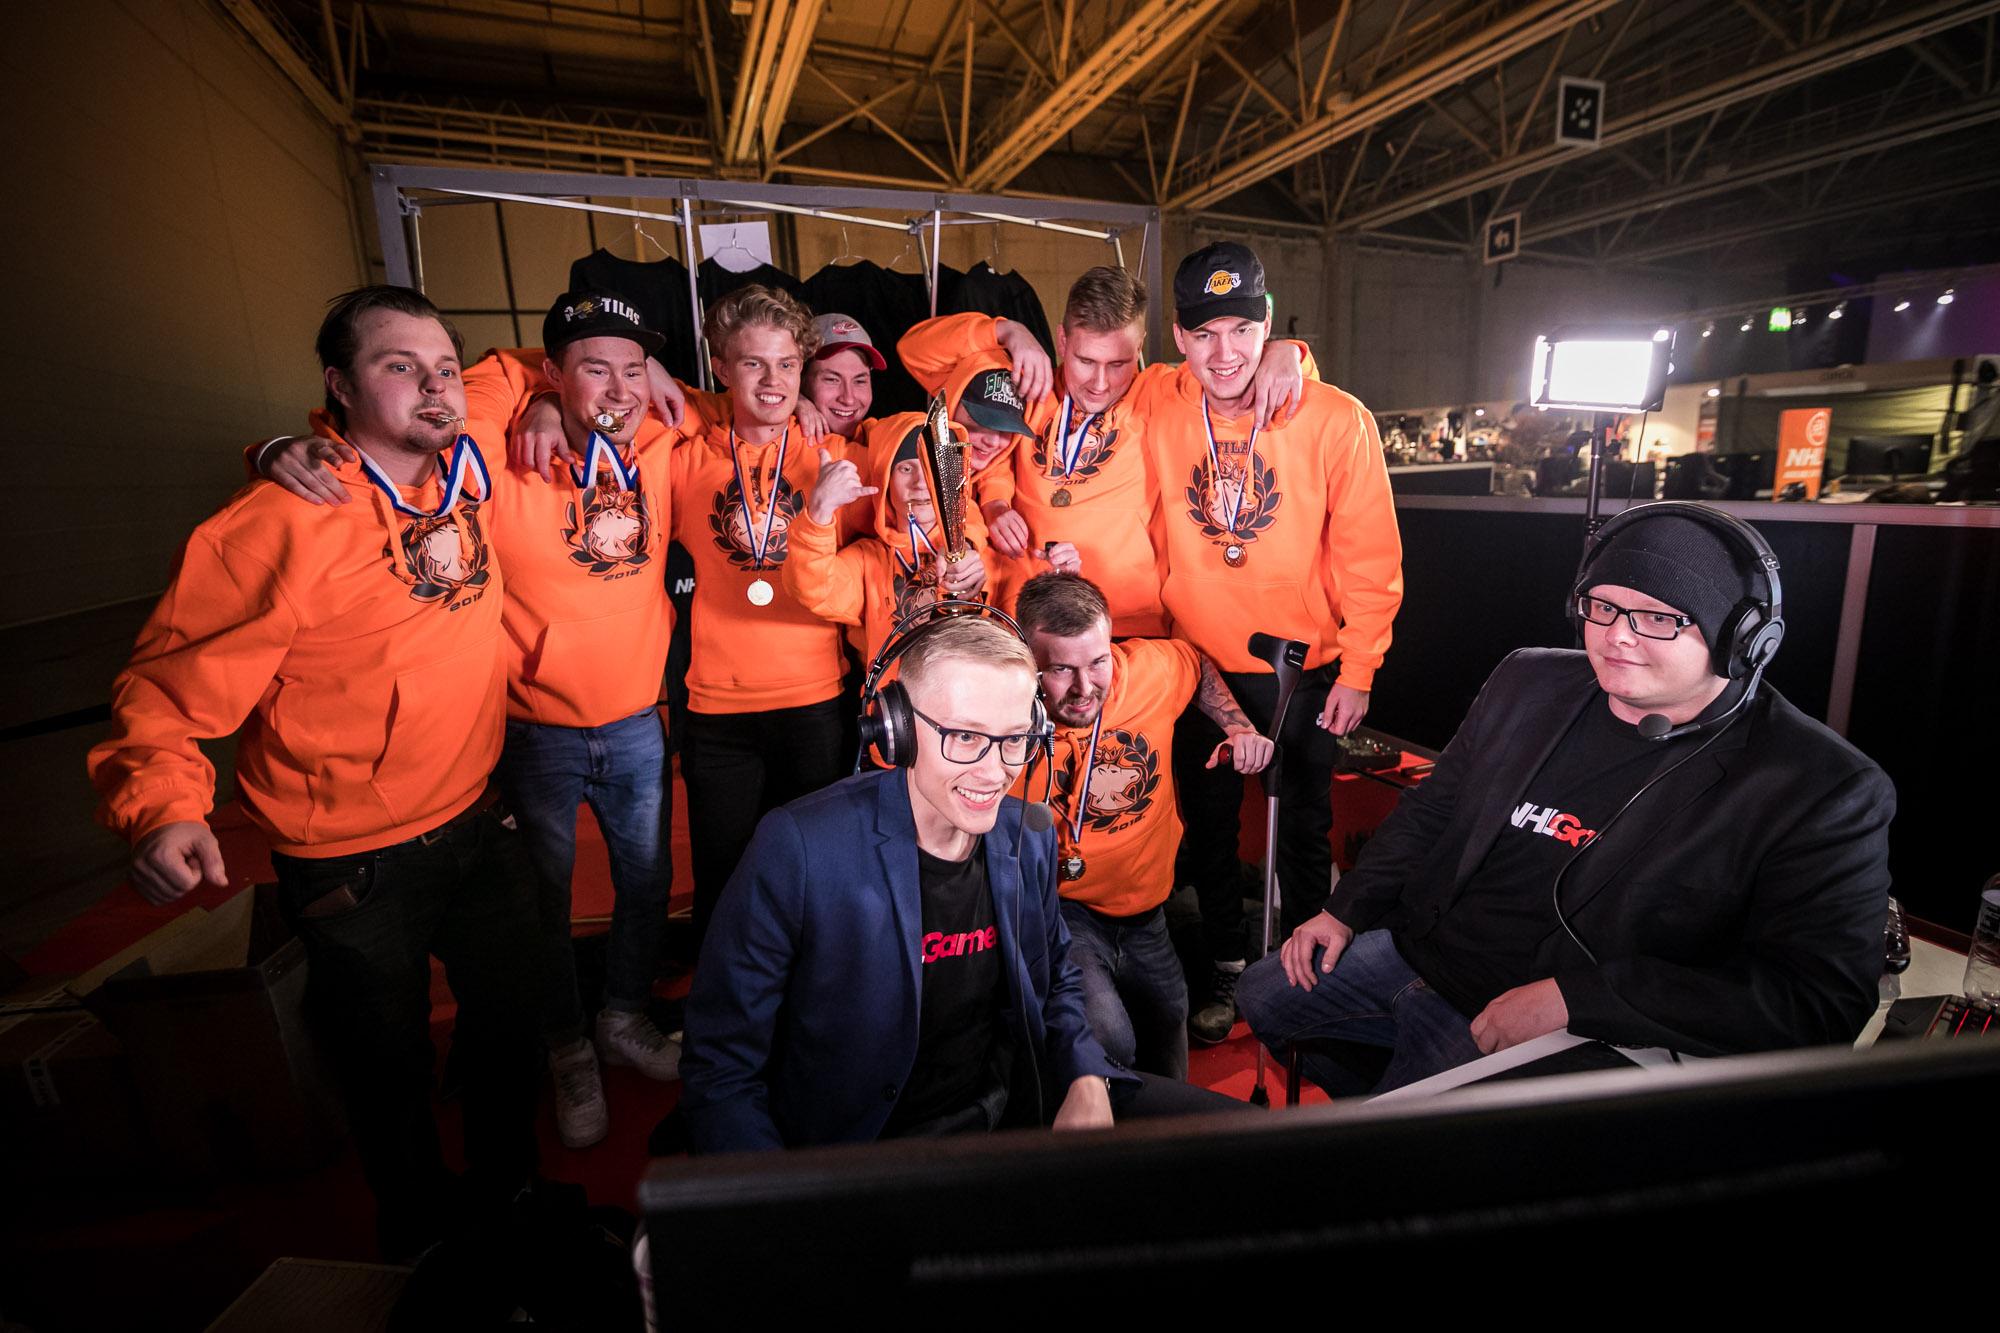 Jaaskelainen-NHLGamers-Gamexpo2018-3053.